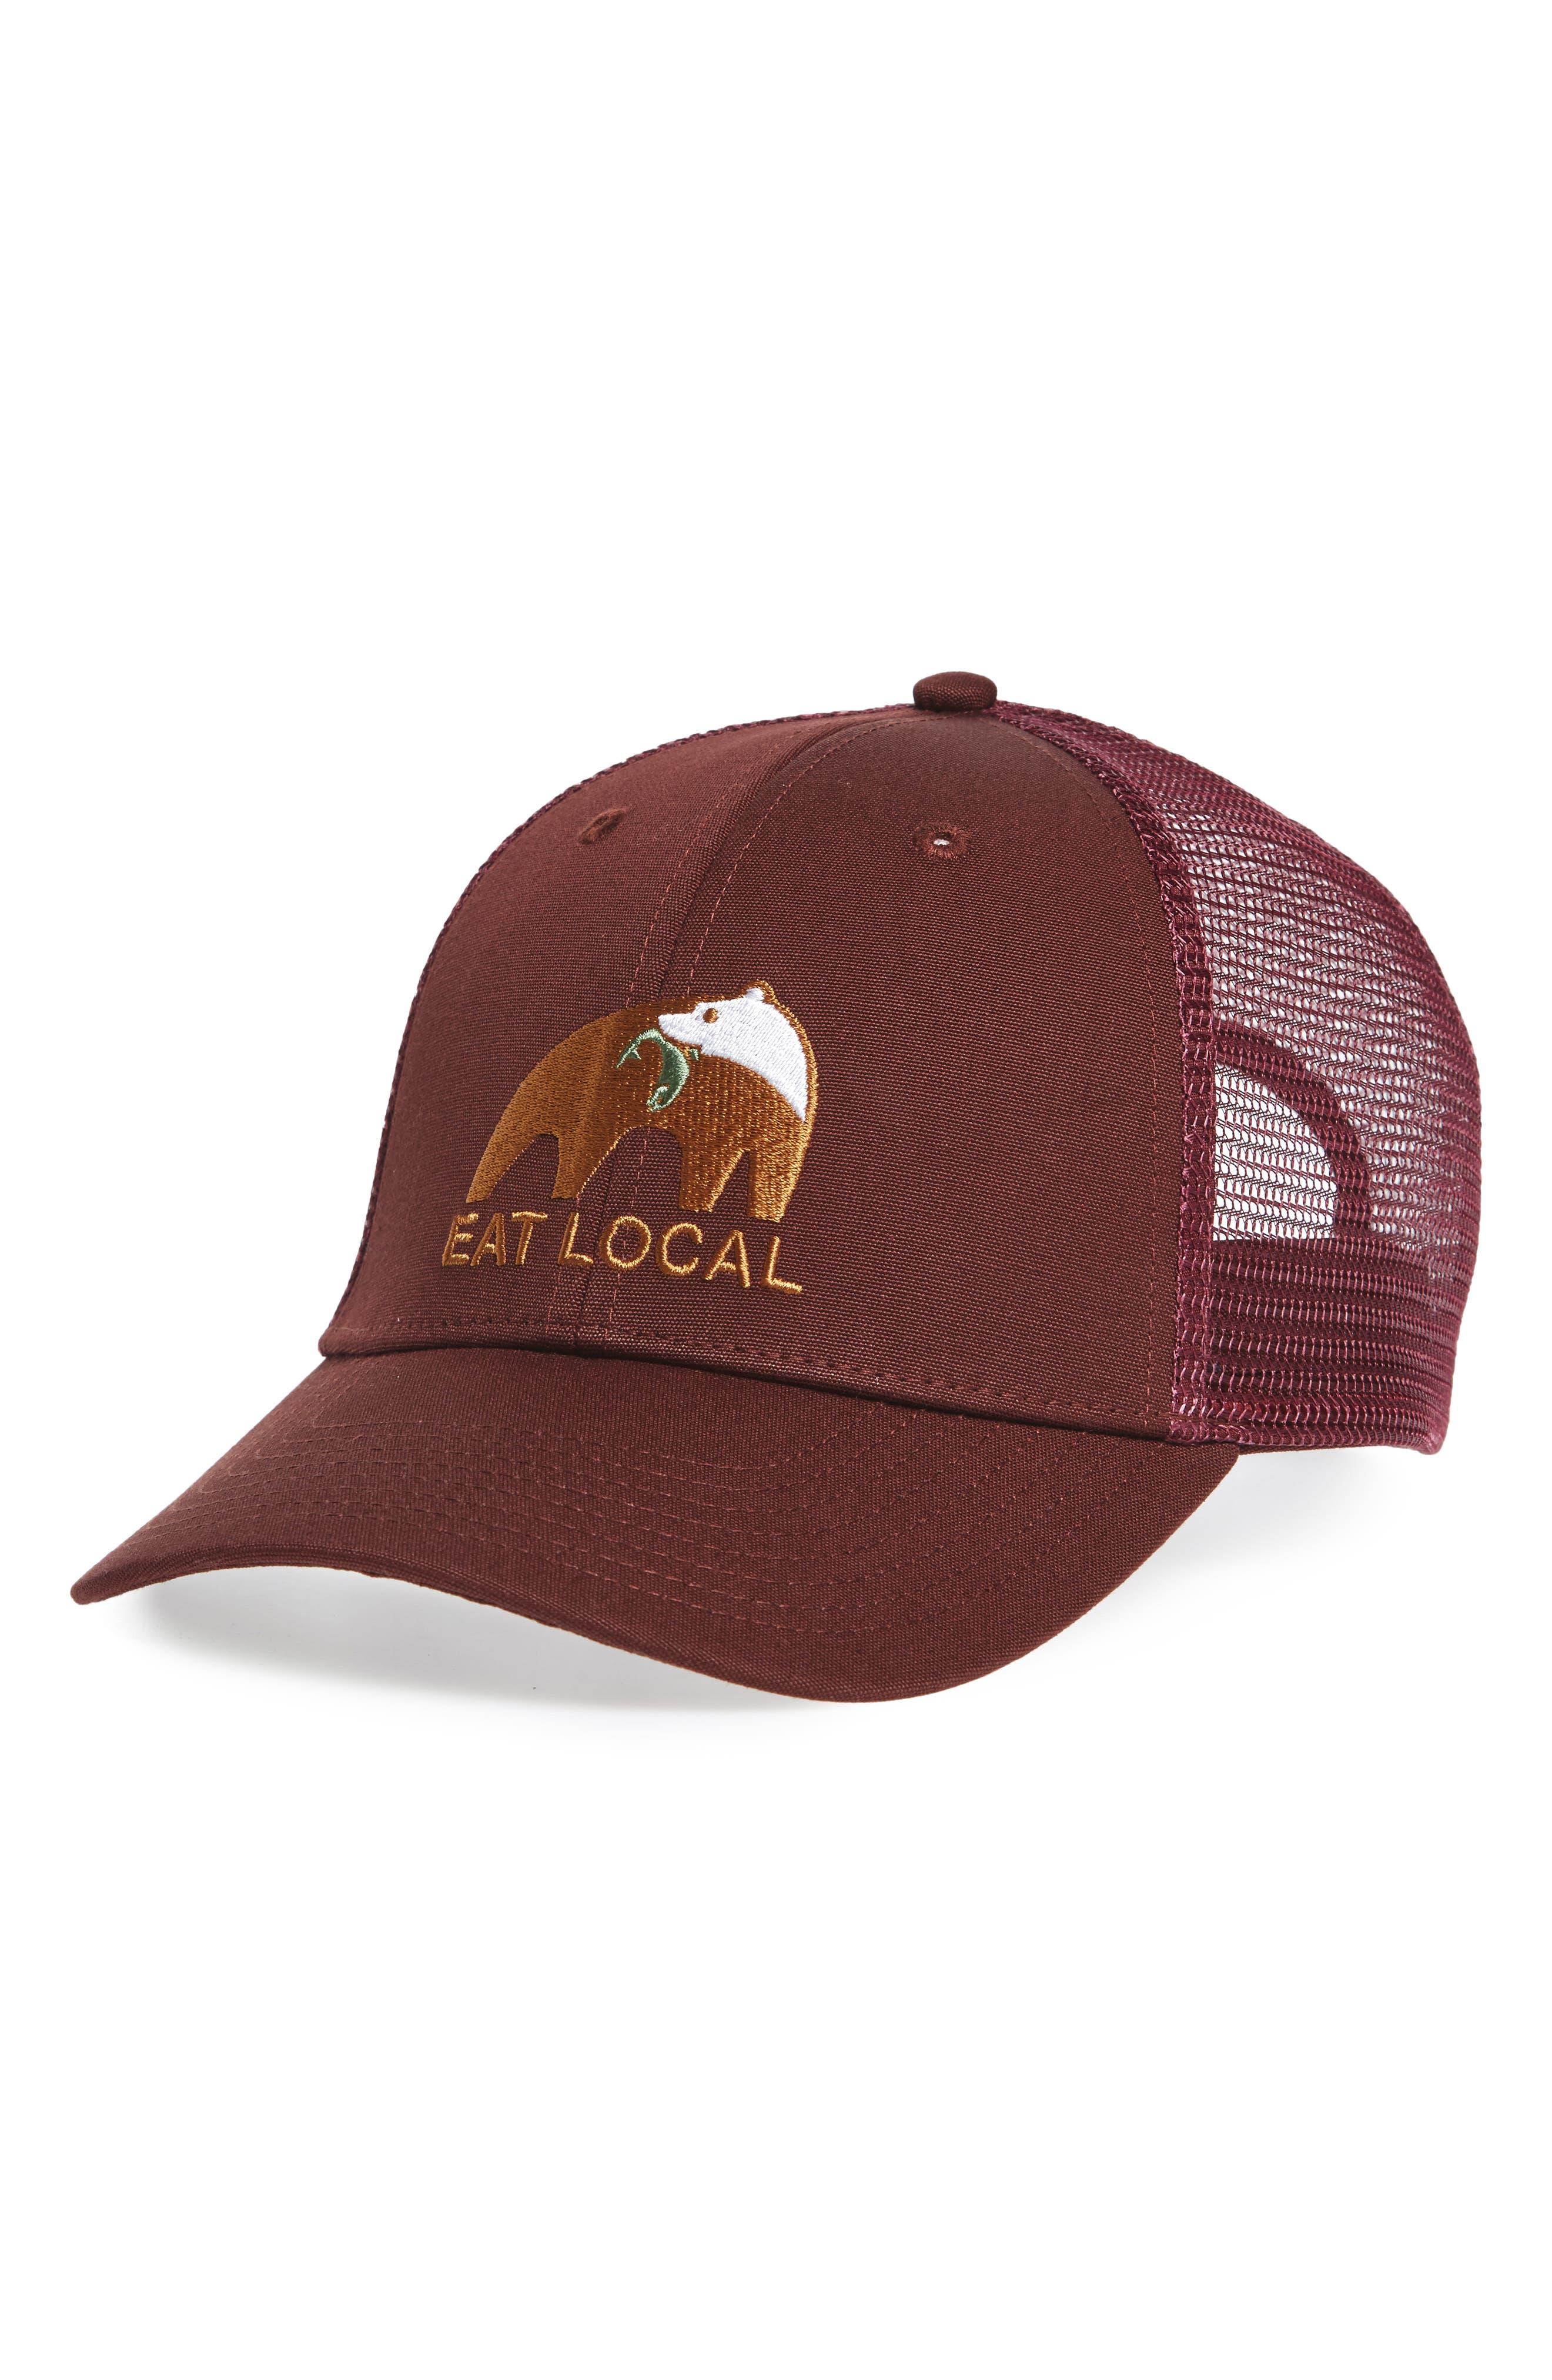 Patagonia Eat Local Upstream Trucker Hat